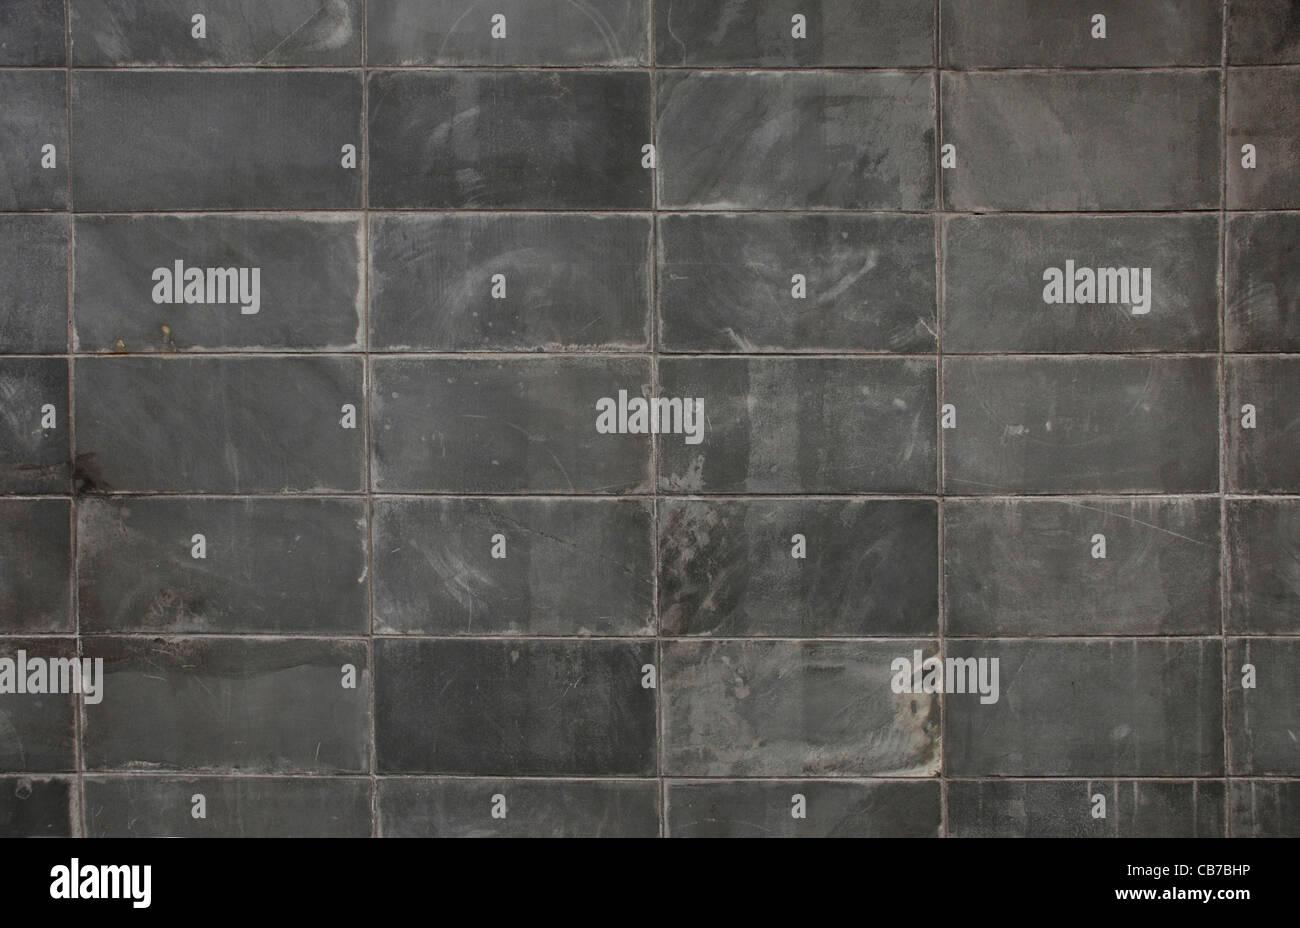 Textura de pared de bloque gris oscura superficie de fondo Imagen De Stock